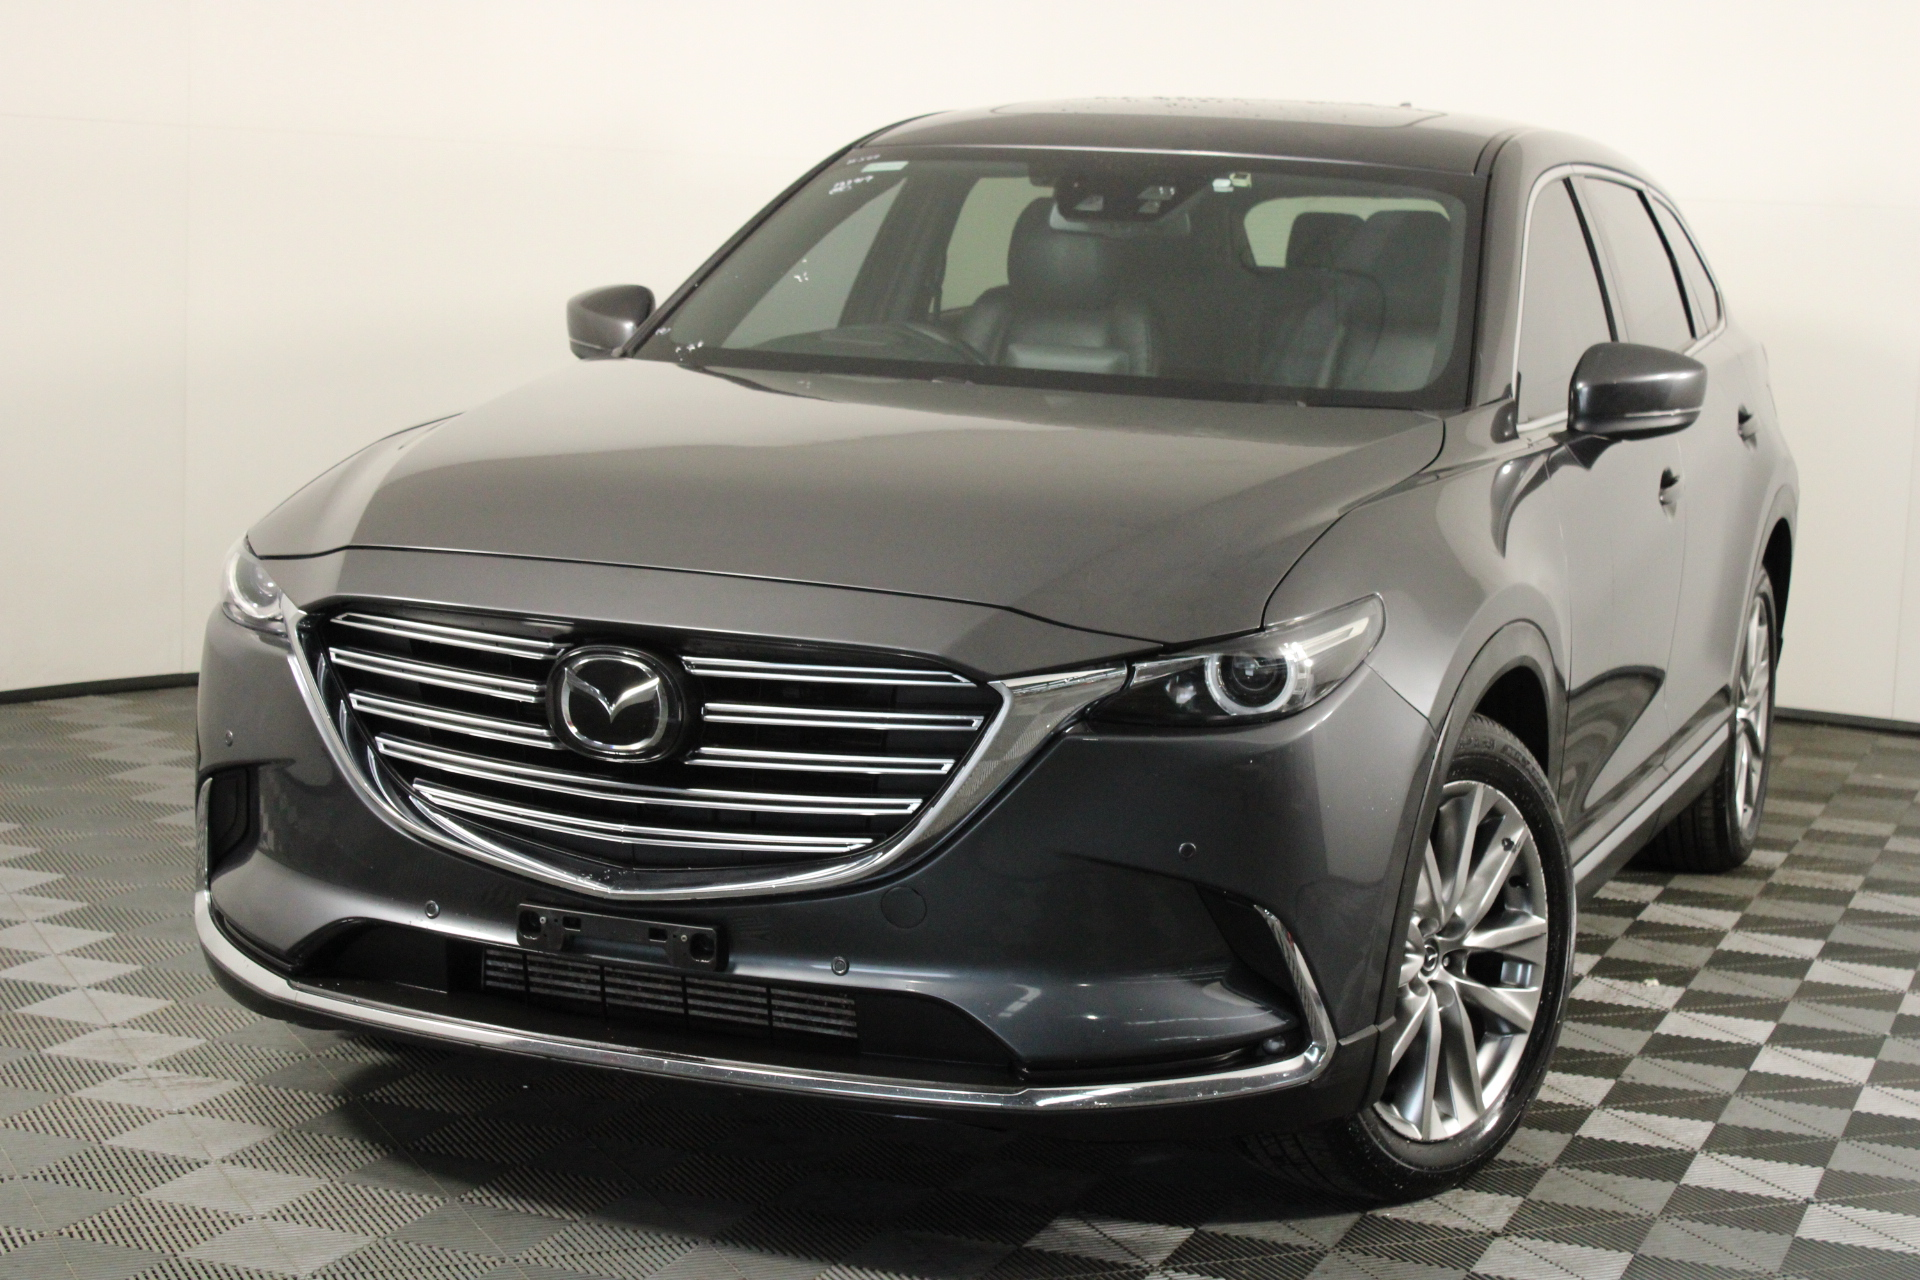 2016 Mazda CX-9 AZAMI AWD TC Automatic 7 Seats Wagon